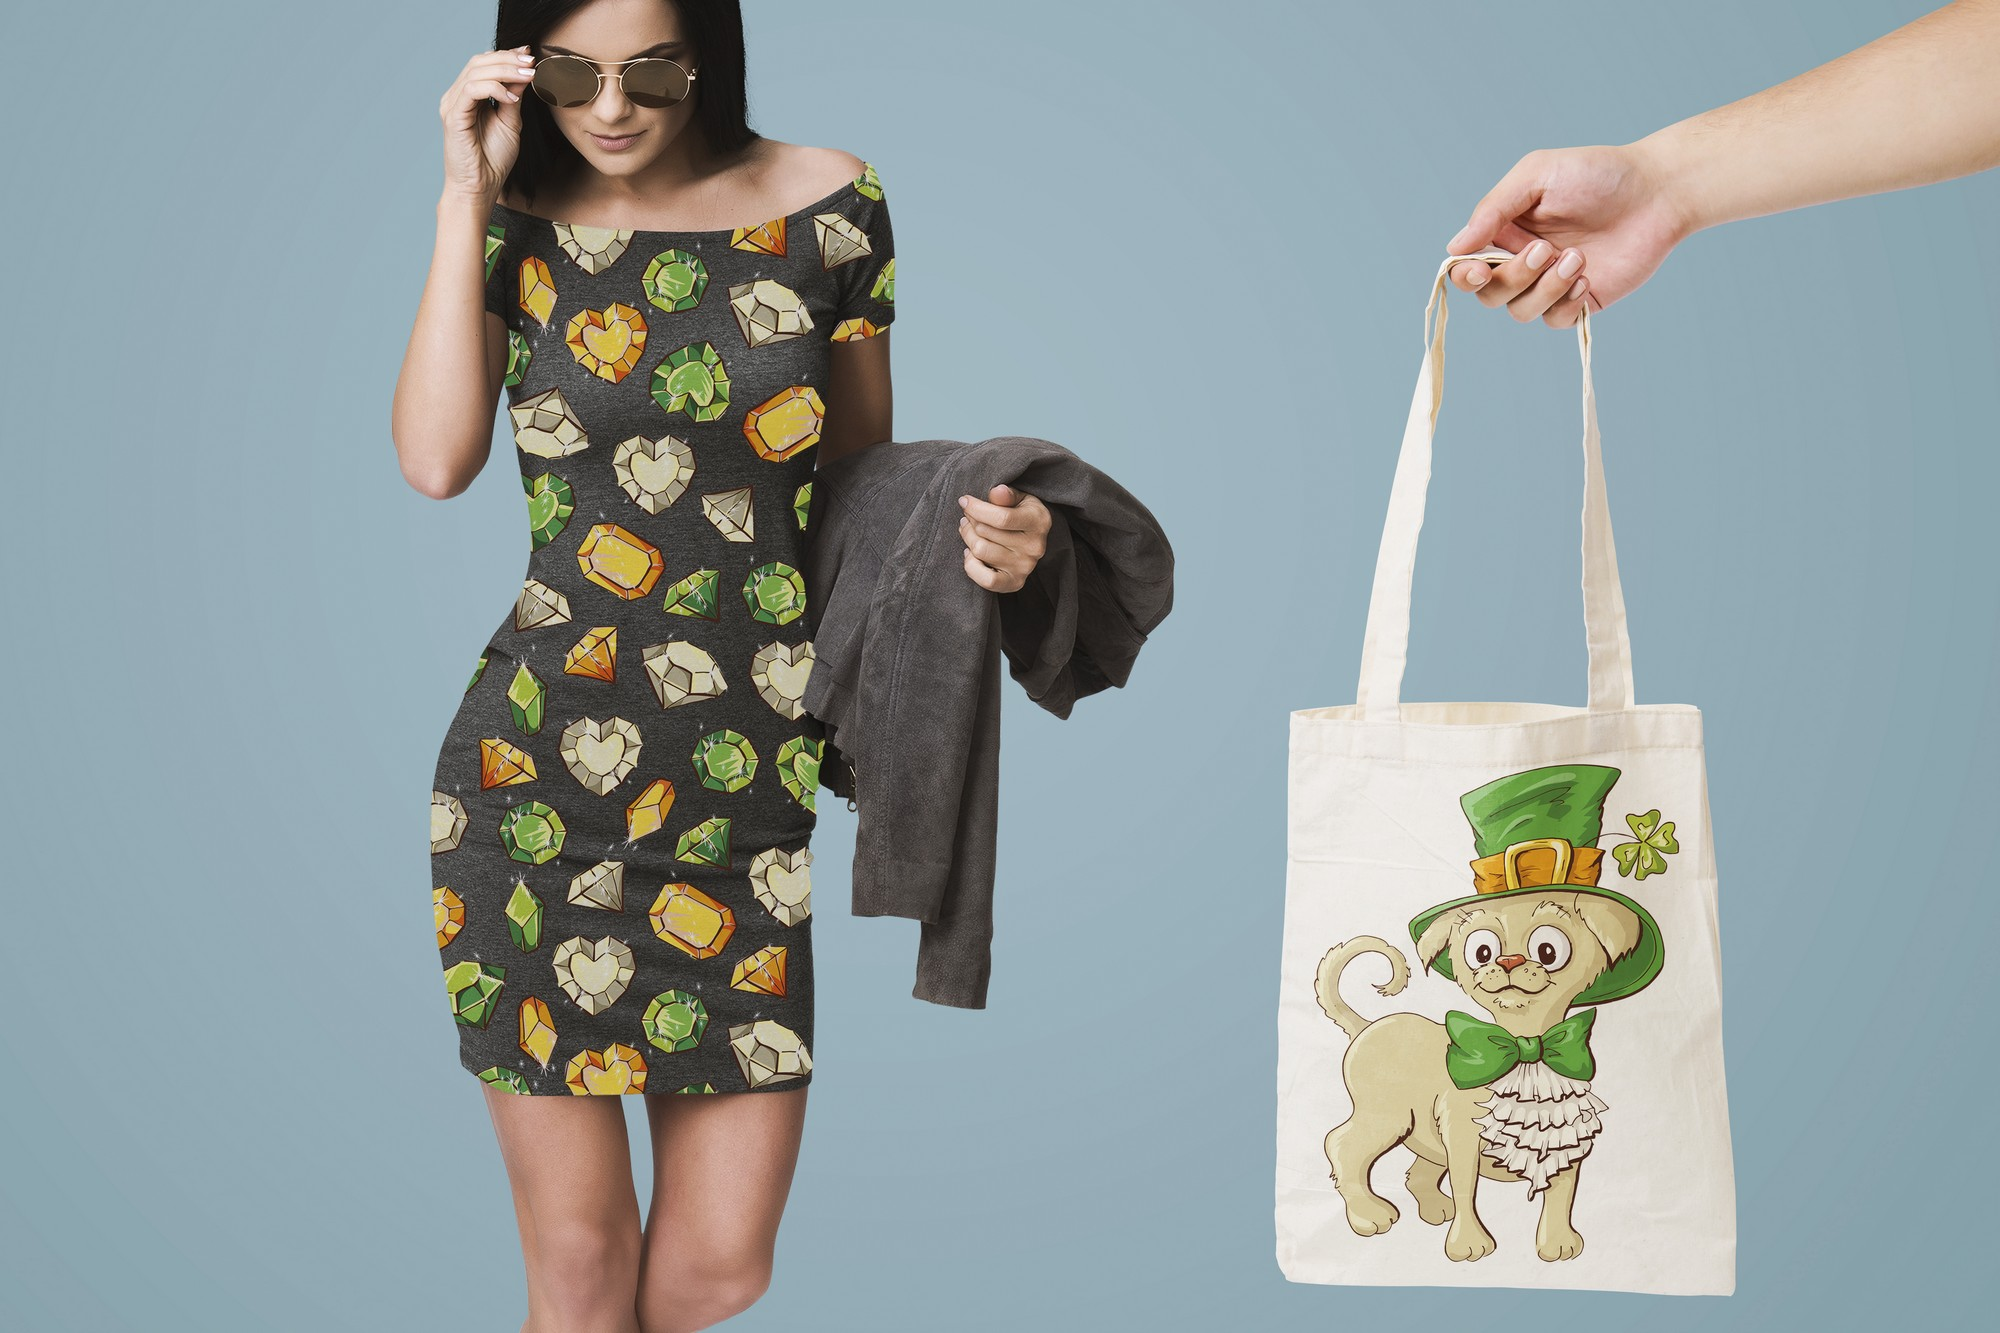 Leprechaun St. Patrick's Day Illustrations Set - $21 - 9 preview